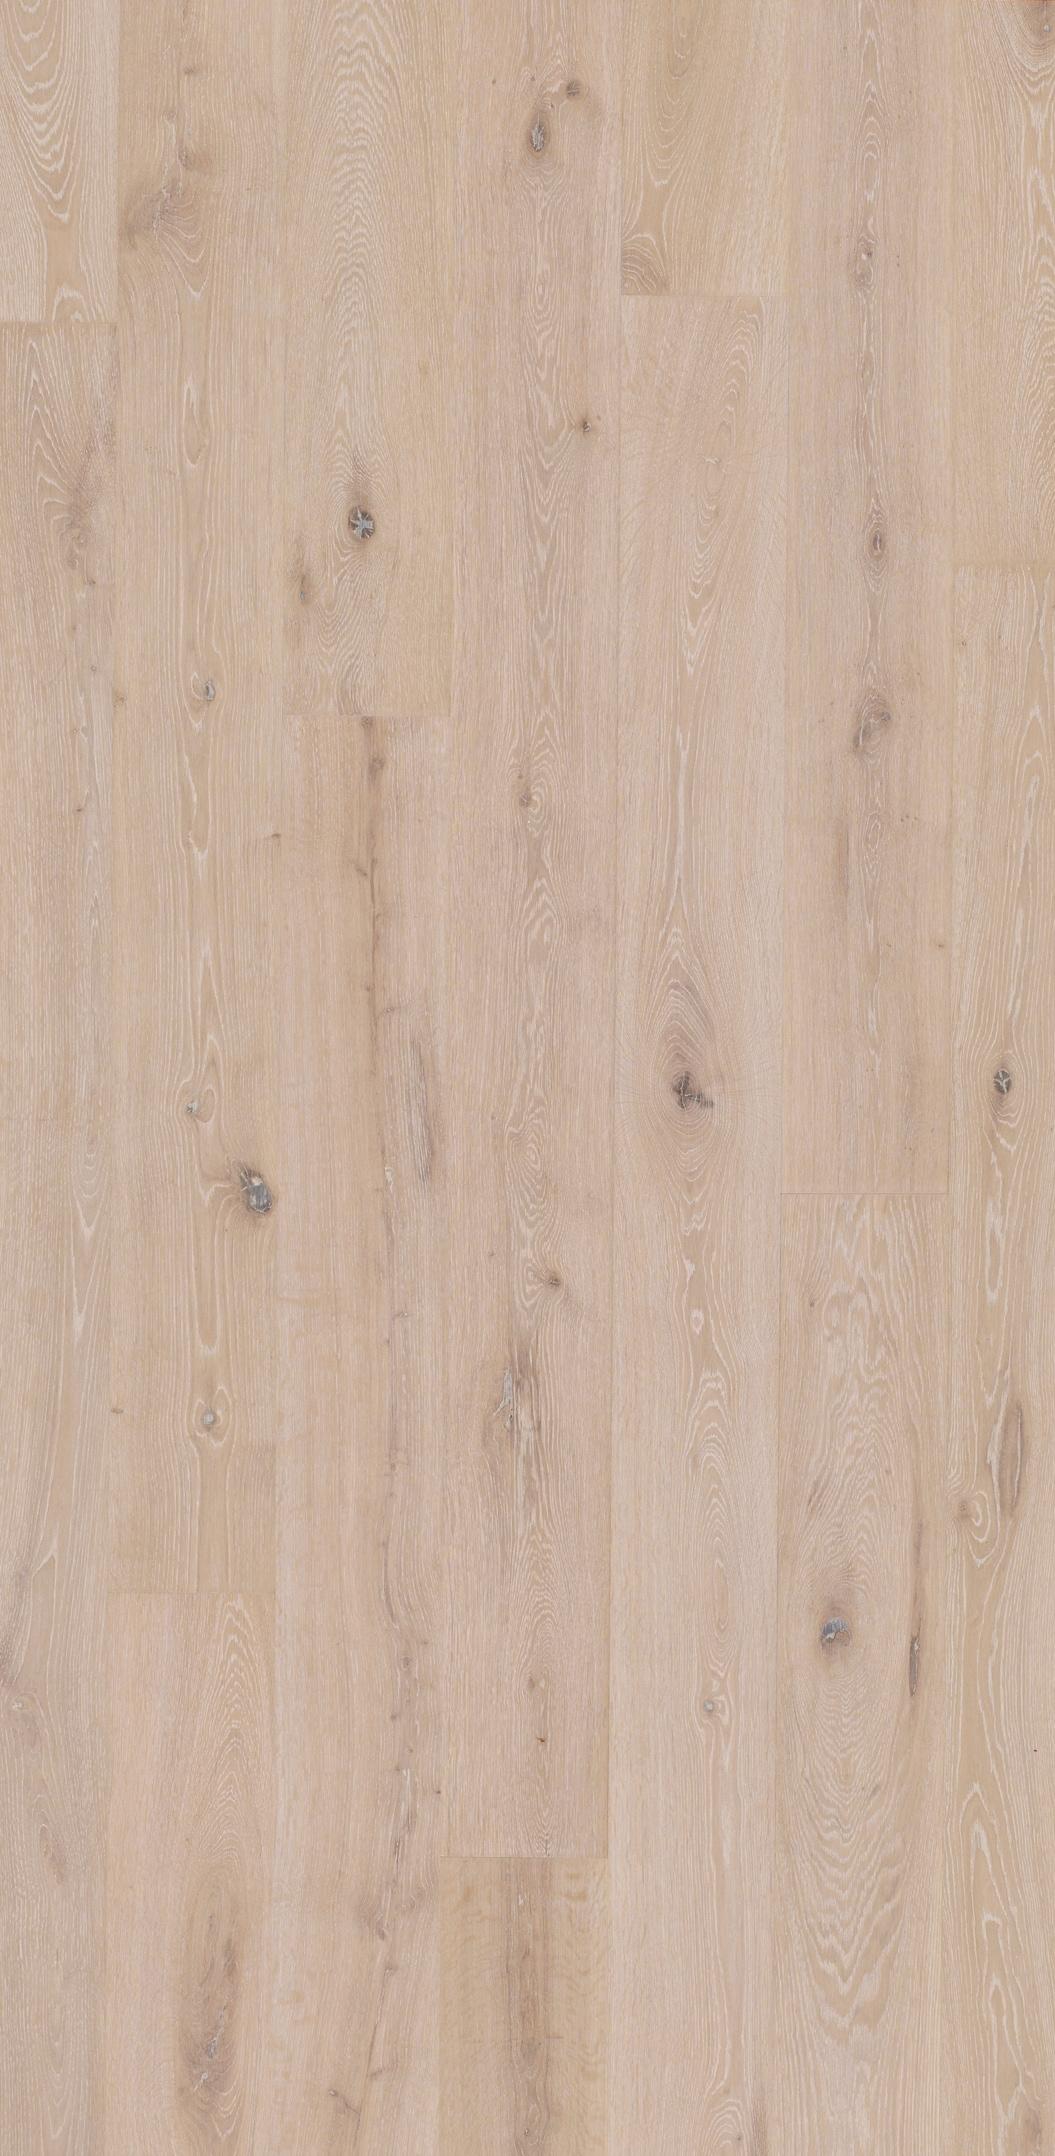 PARADOR Parkett »Eco Balance Rustikal - Eiche gebürstet«, 2200 x 185 mm, Stärke: 13 mm, 3, 66 m² | Baumarkt > Bodenbeläge > Parkett | Braun | Eiche - Gebürstet - Geölt | PARADOR